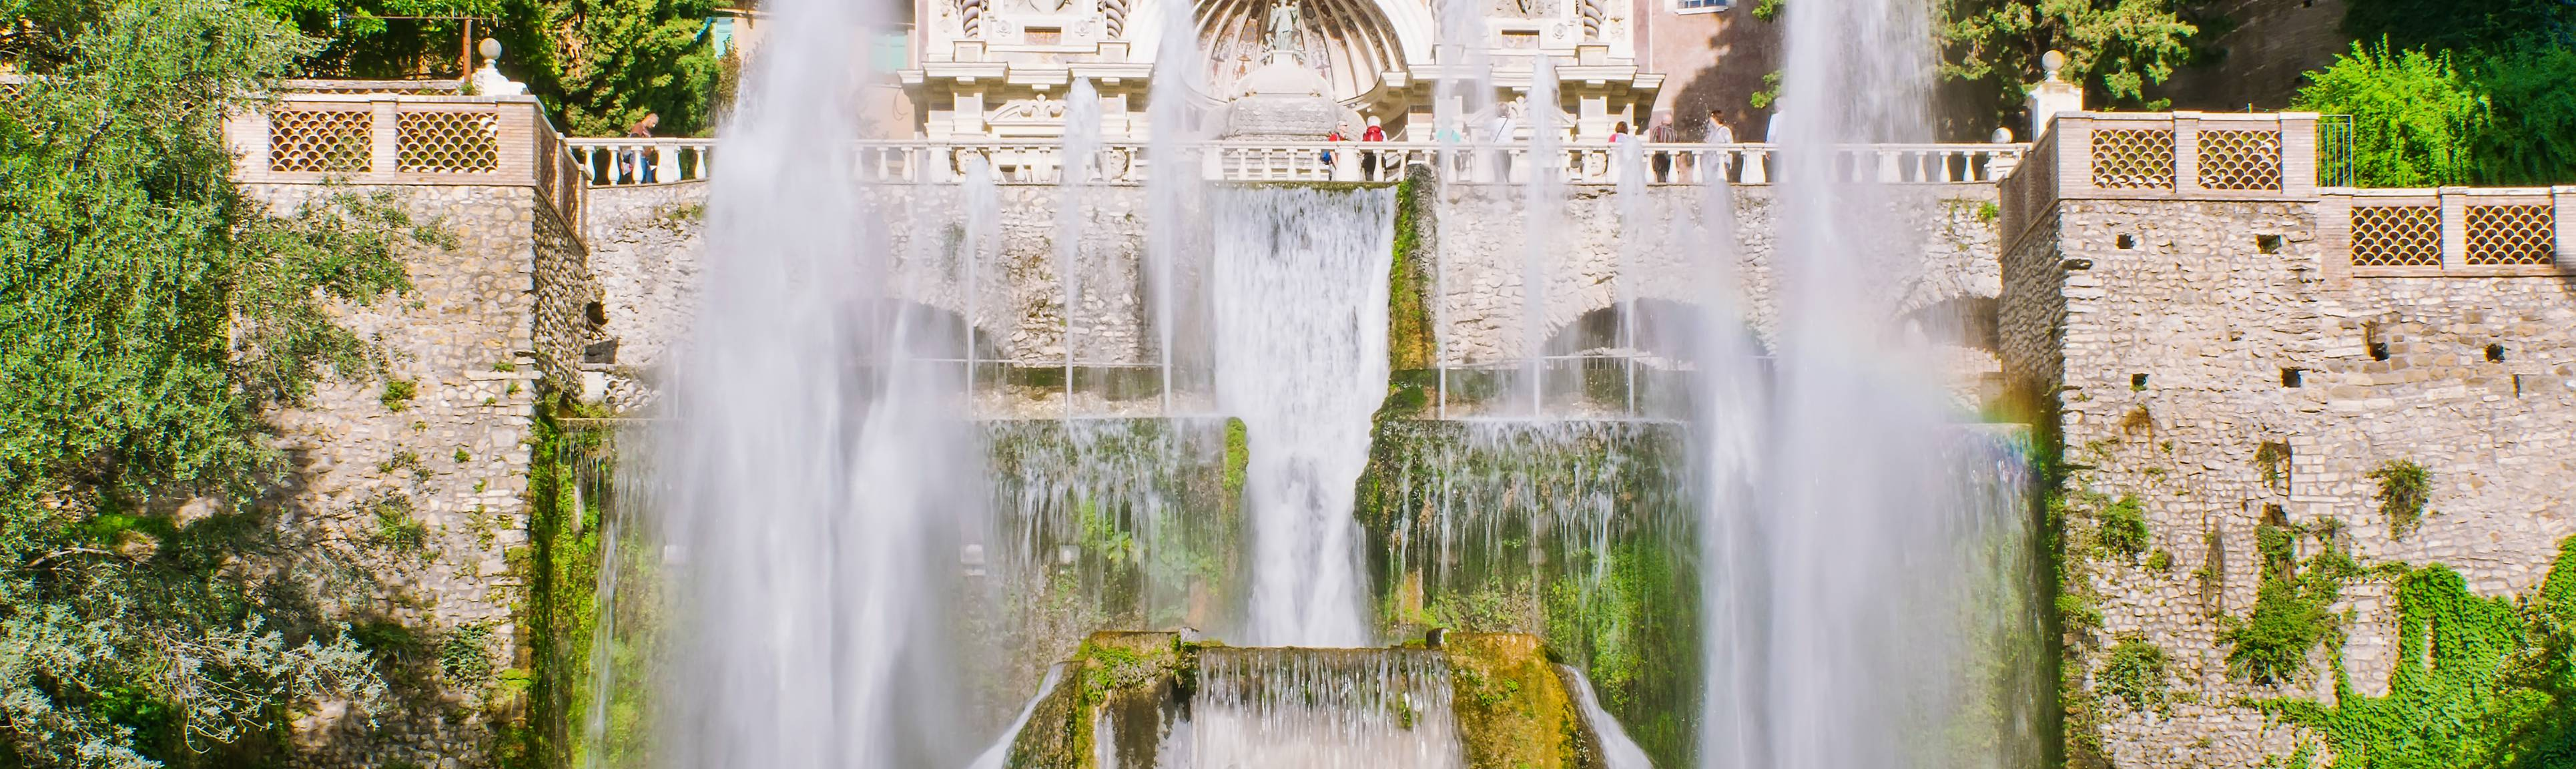 Two fountains with Villa D'Este in the background in Tivoli